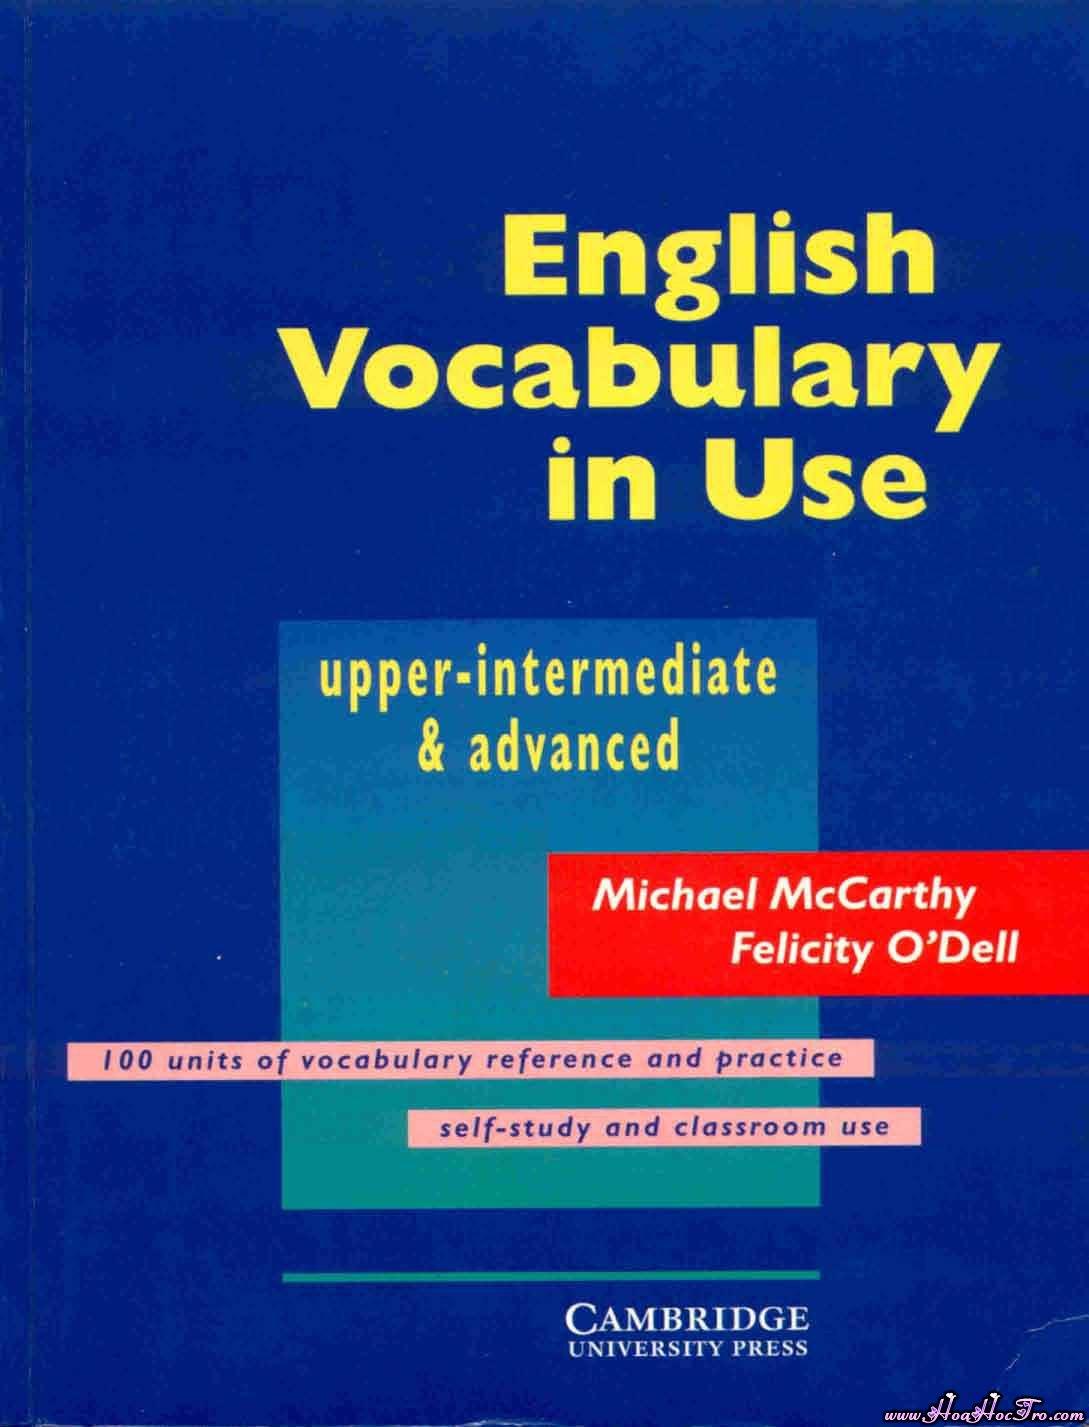 تحميل كتاب english vocabulary in use